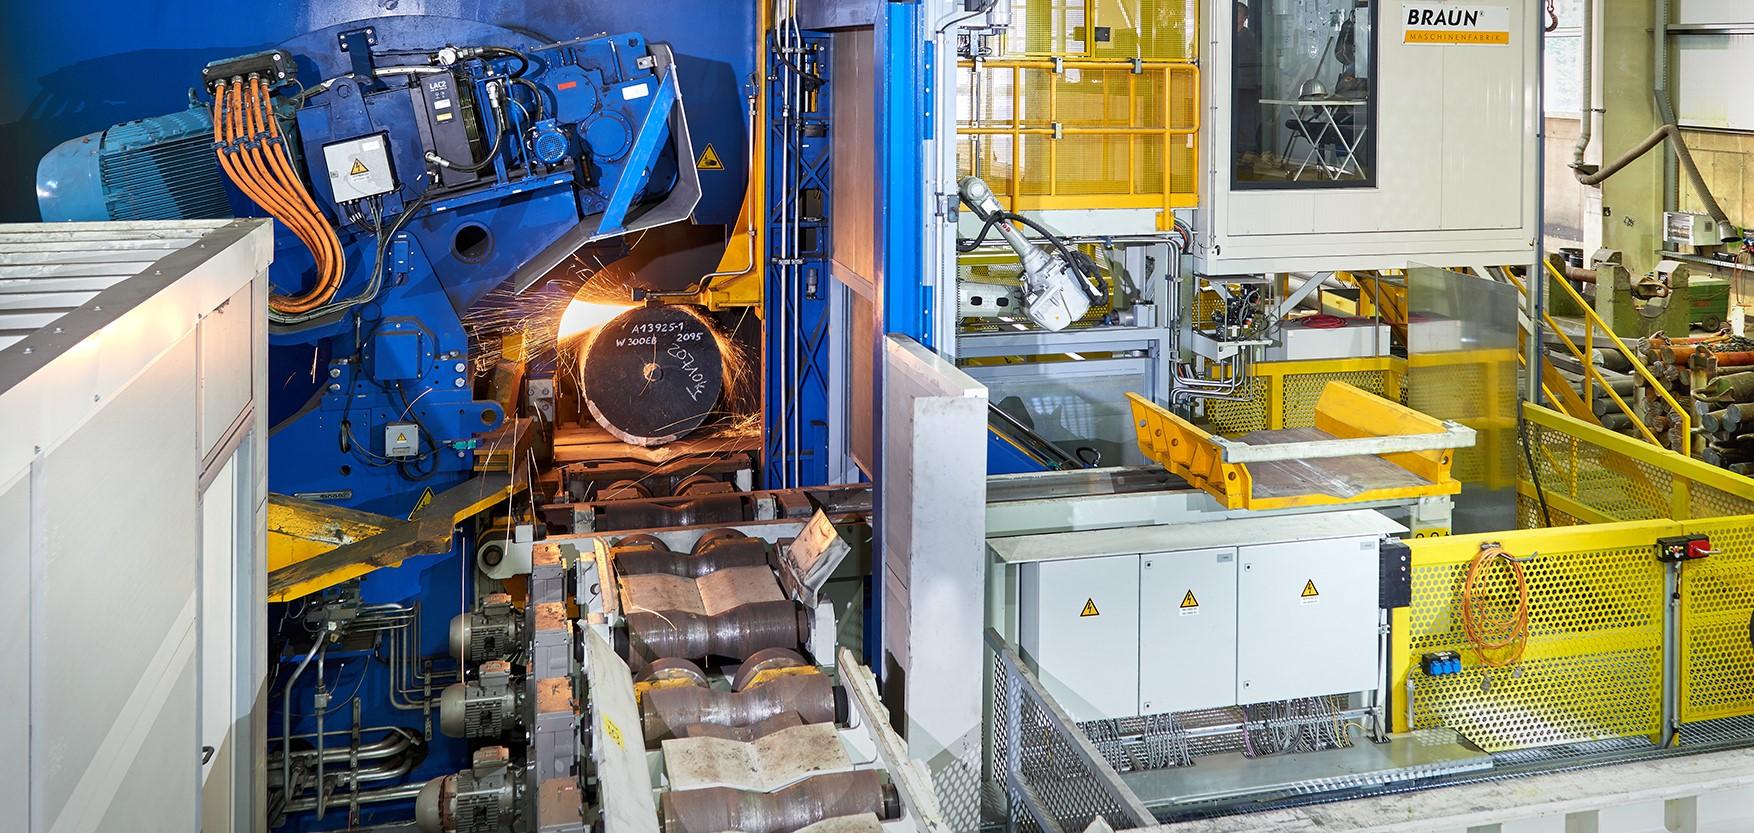 Braun Technologies High Performance Abrasive Cut Off Machines